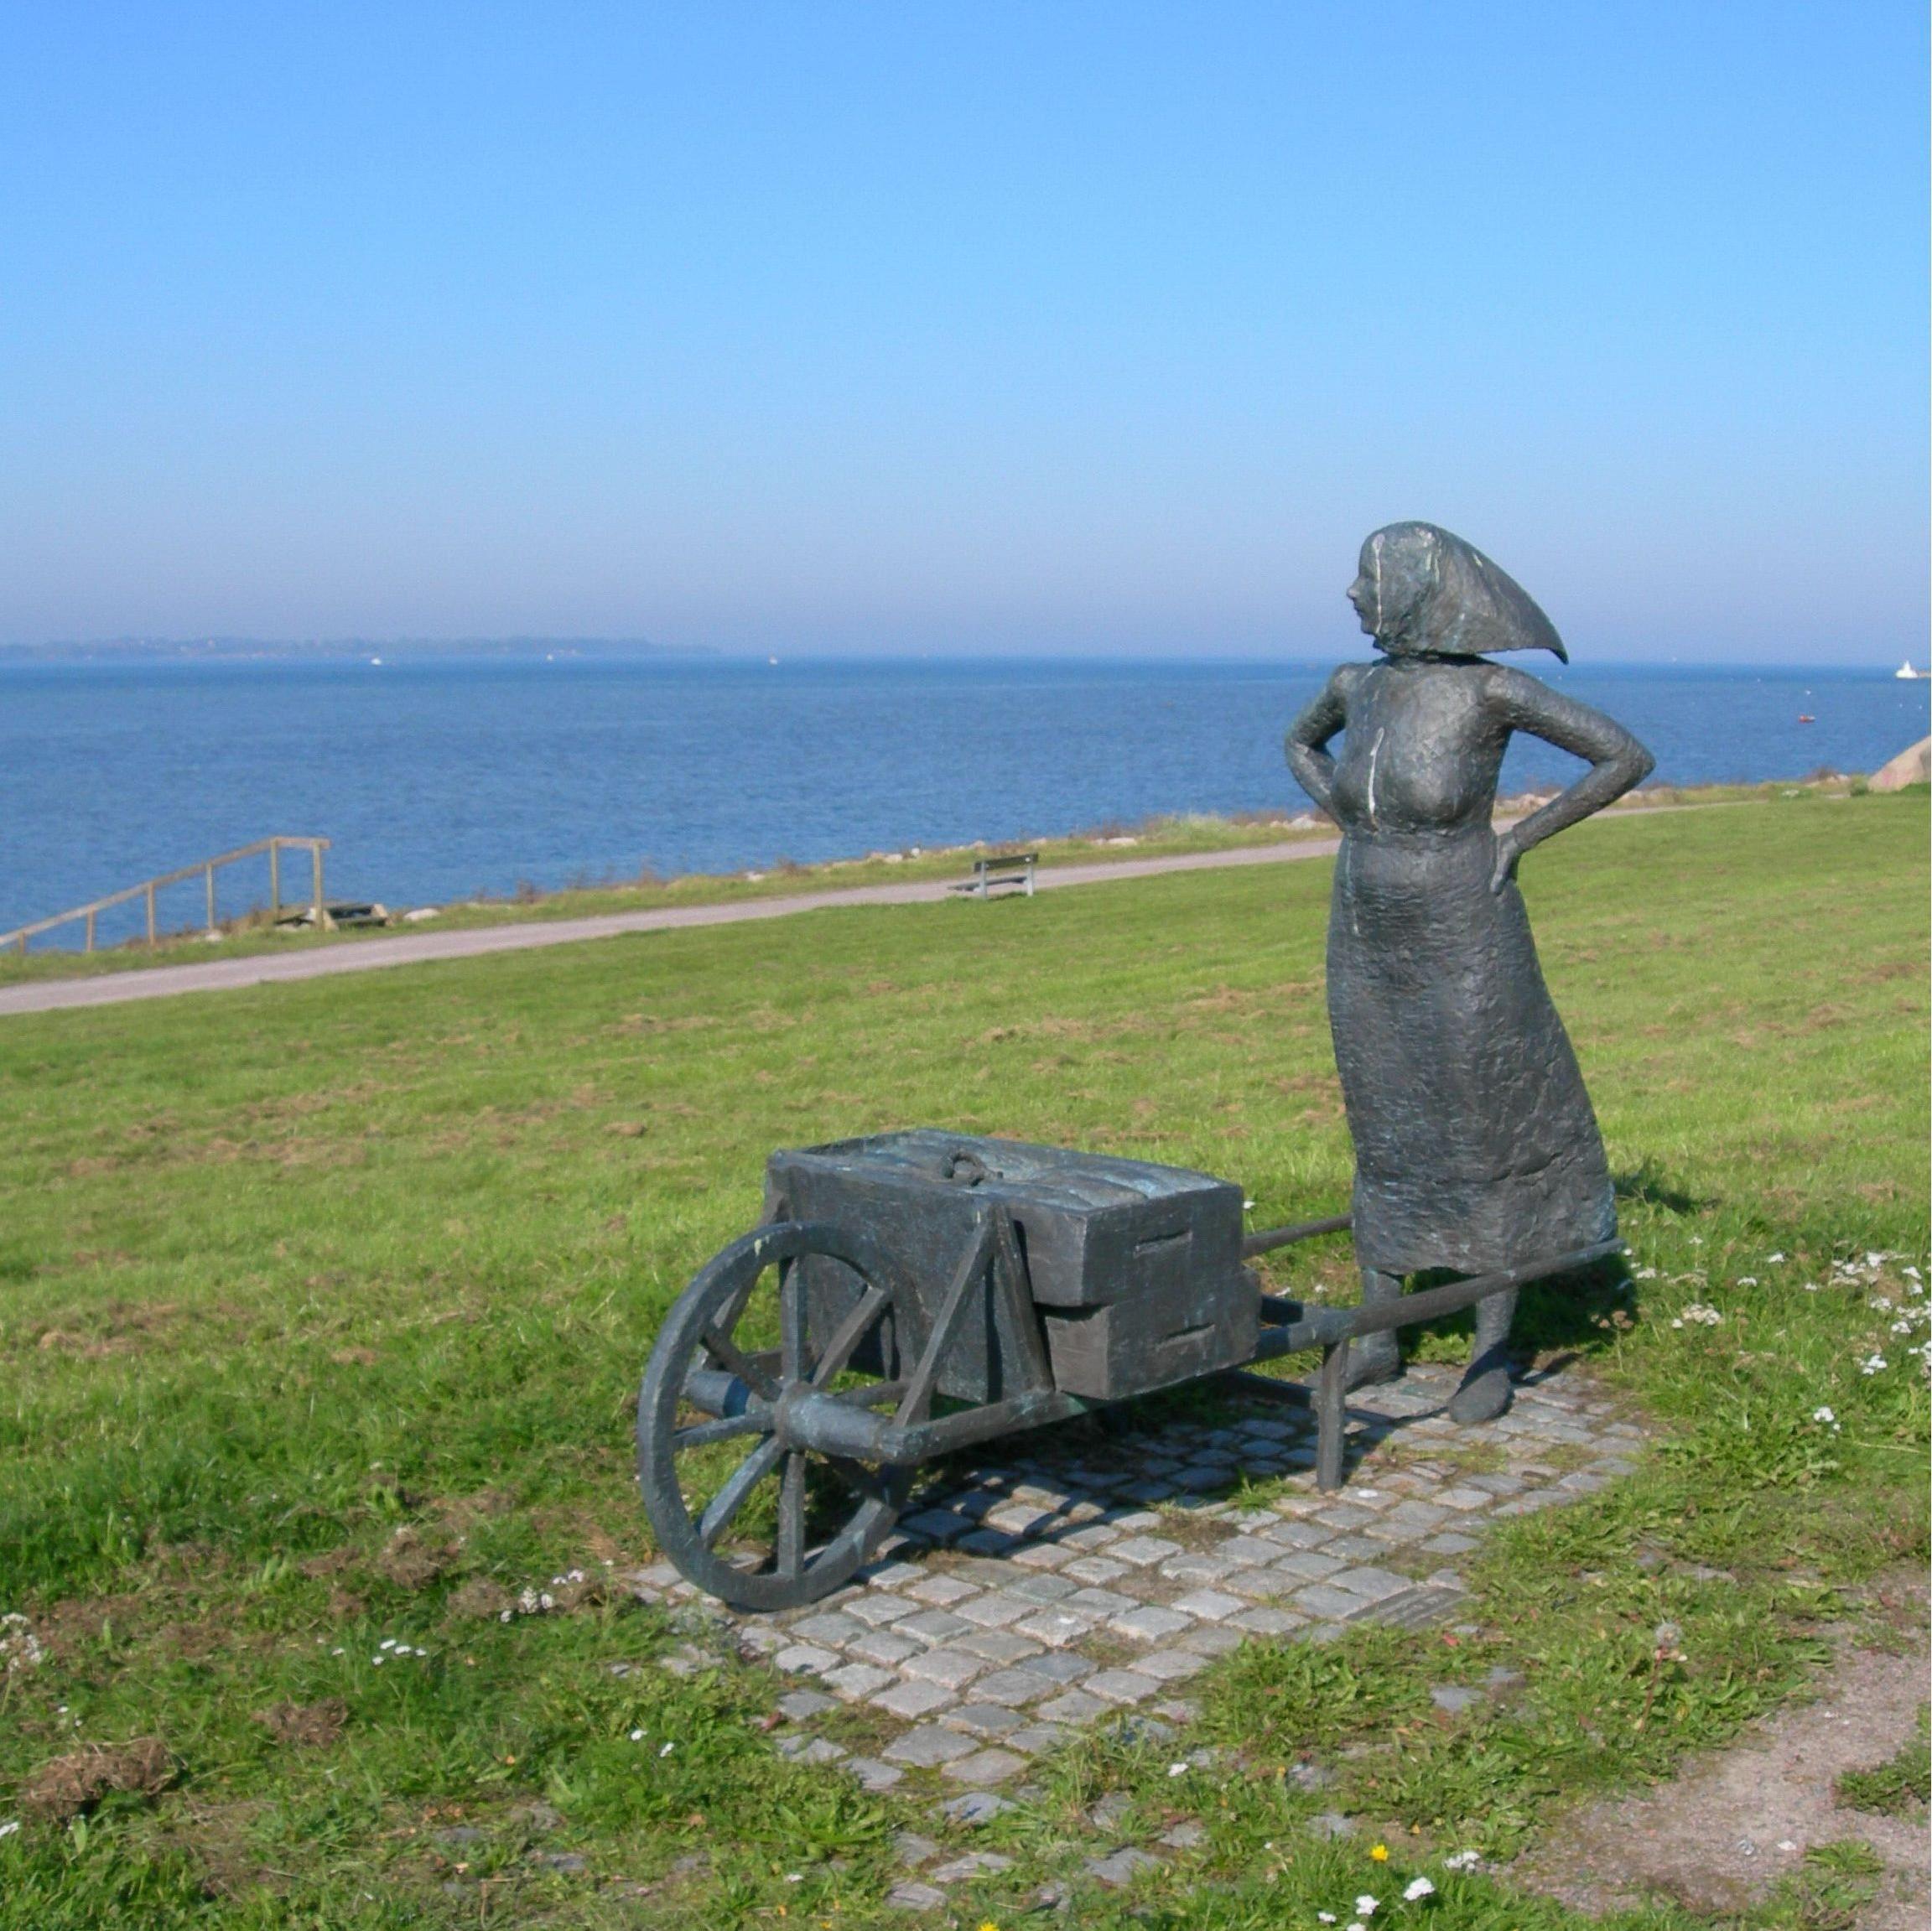 Foto: Turistbyrån Landskrona - Ven, Borstahusen